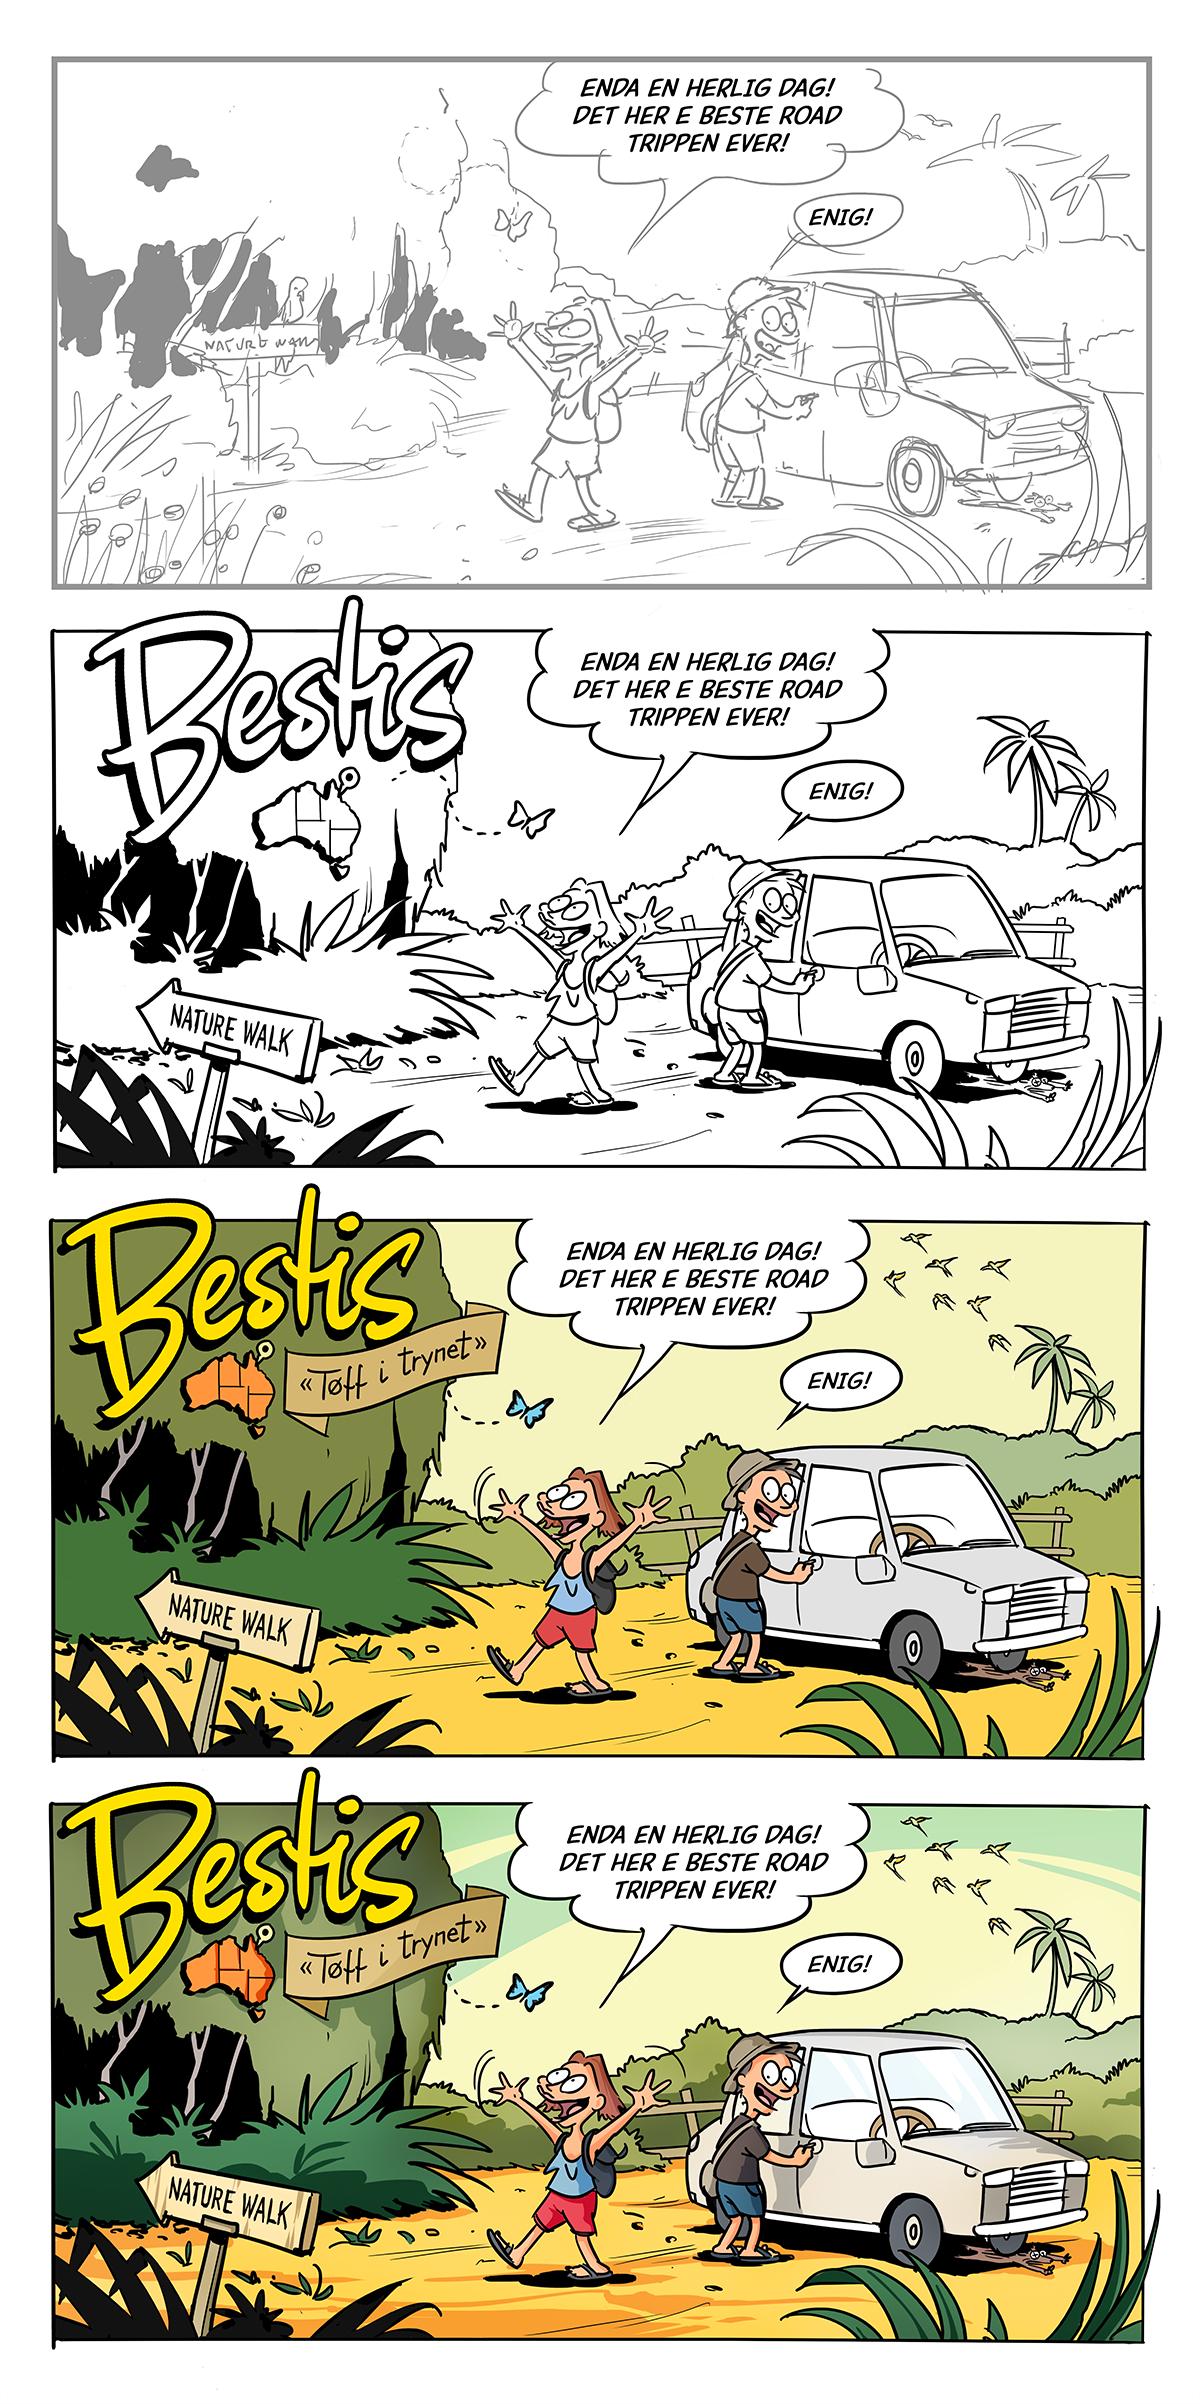 Bestis – Tøff i trynet